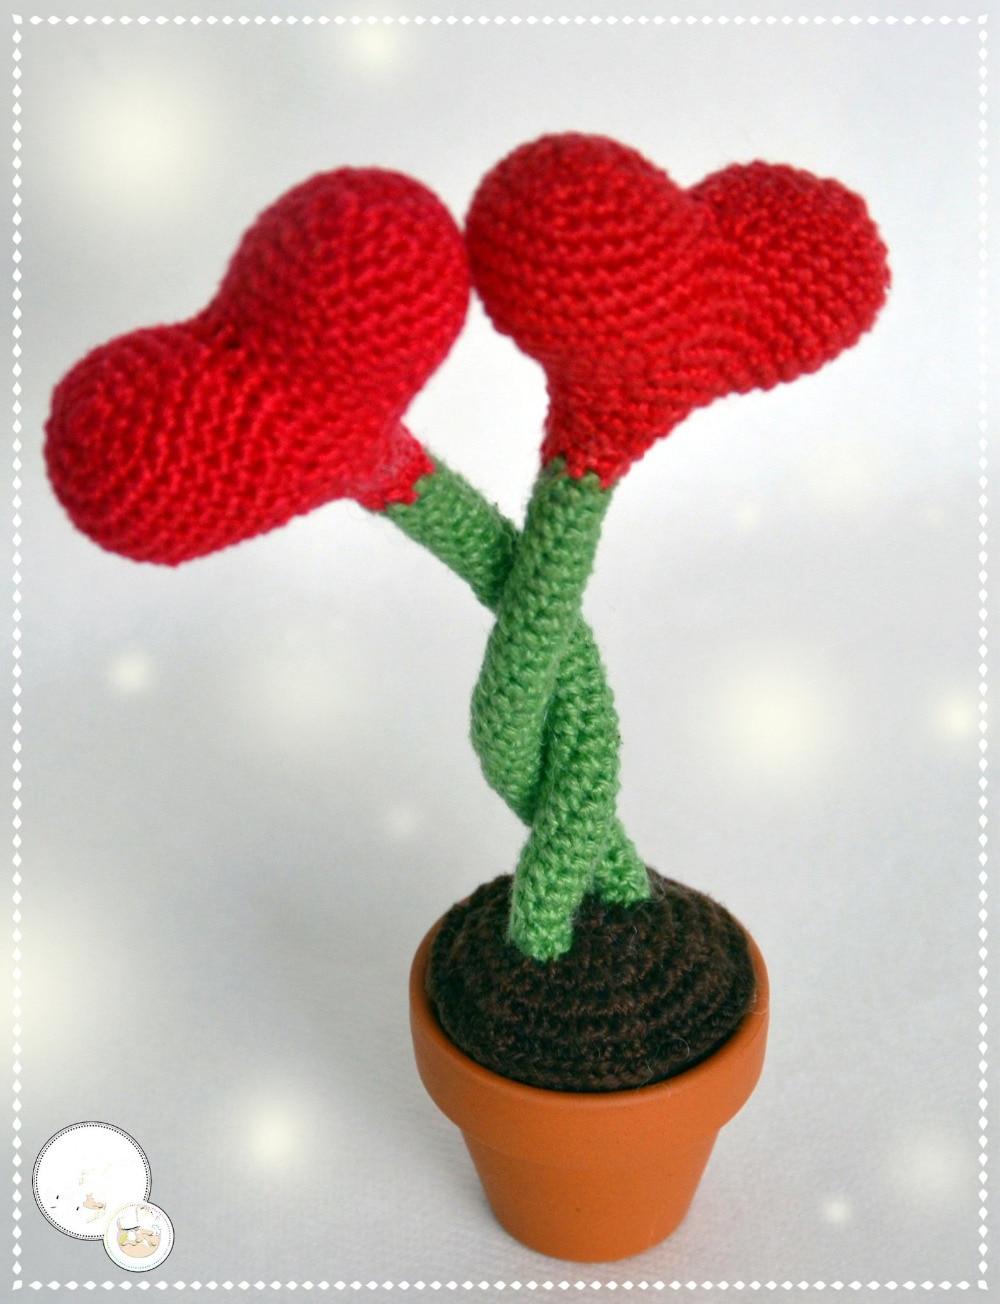 Crochet Toys  Amigurumi  Doll Heart Flower  Model    Number XN041042